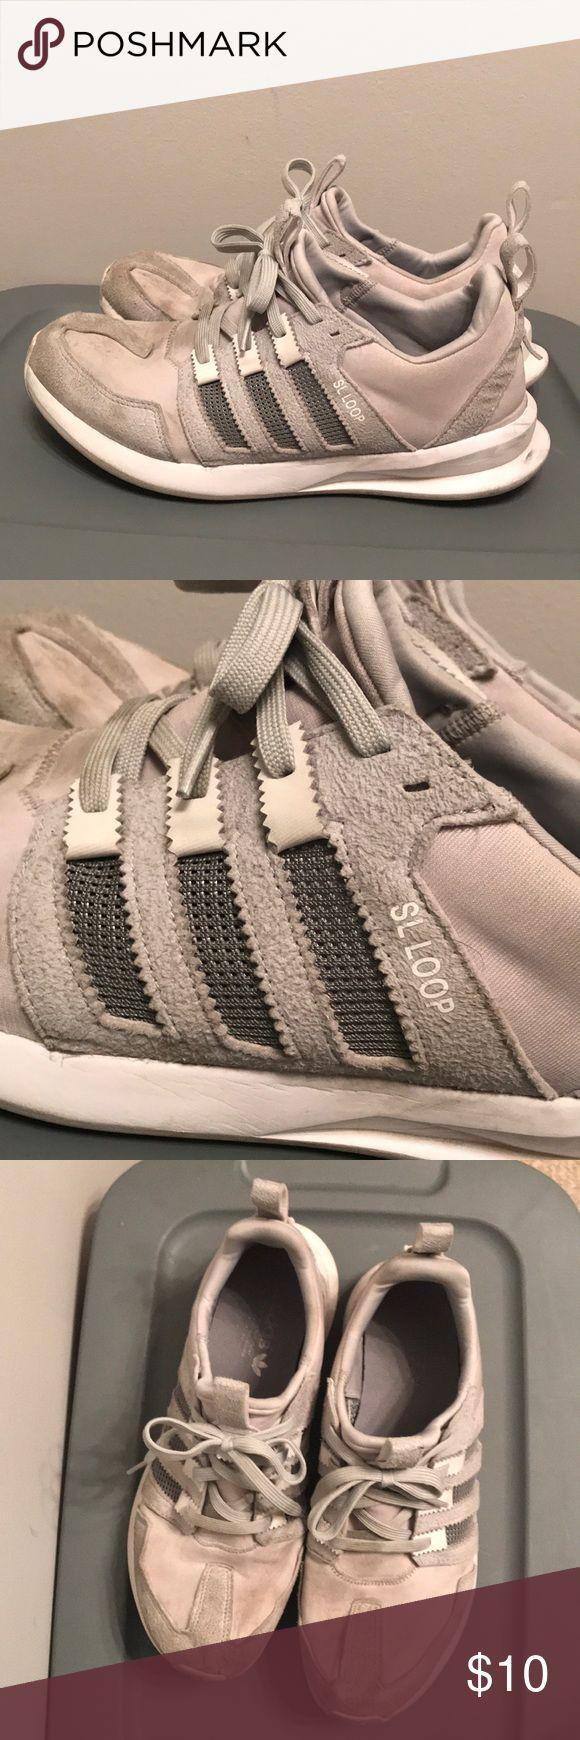 Adidas SL Loop Men's Adidas SL Loop size 11 in light grey. Average condition. adidas Shoes Athletic Shoes